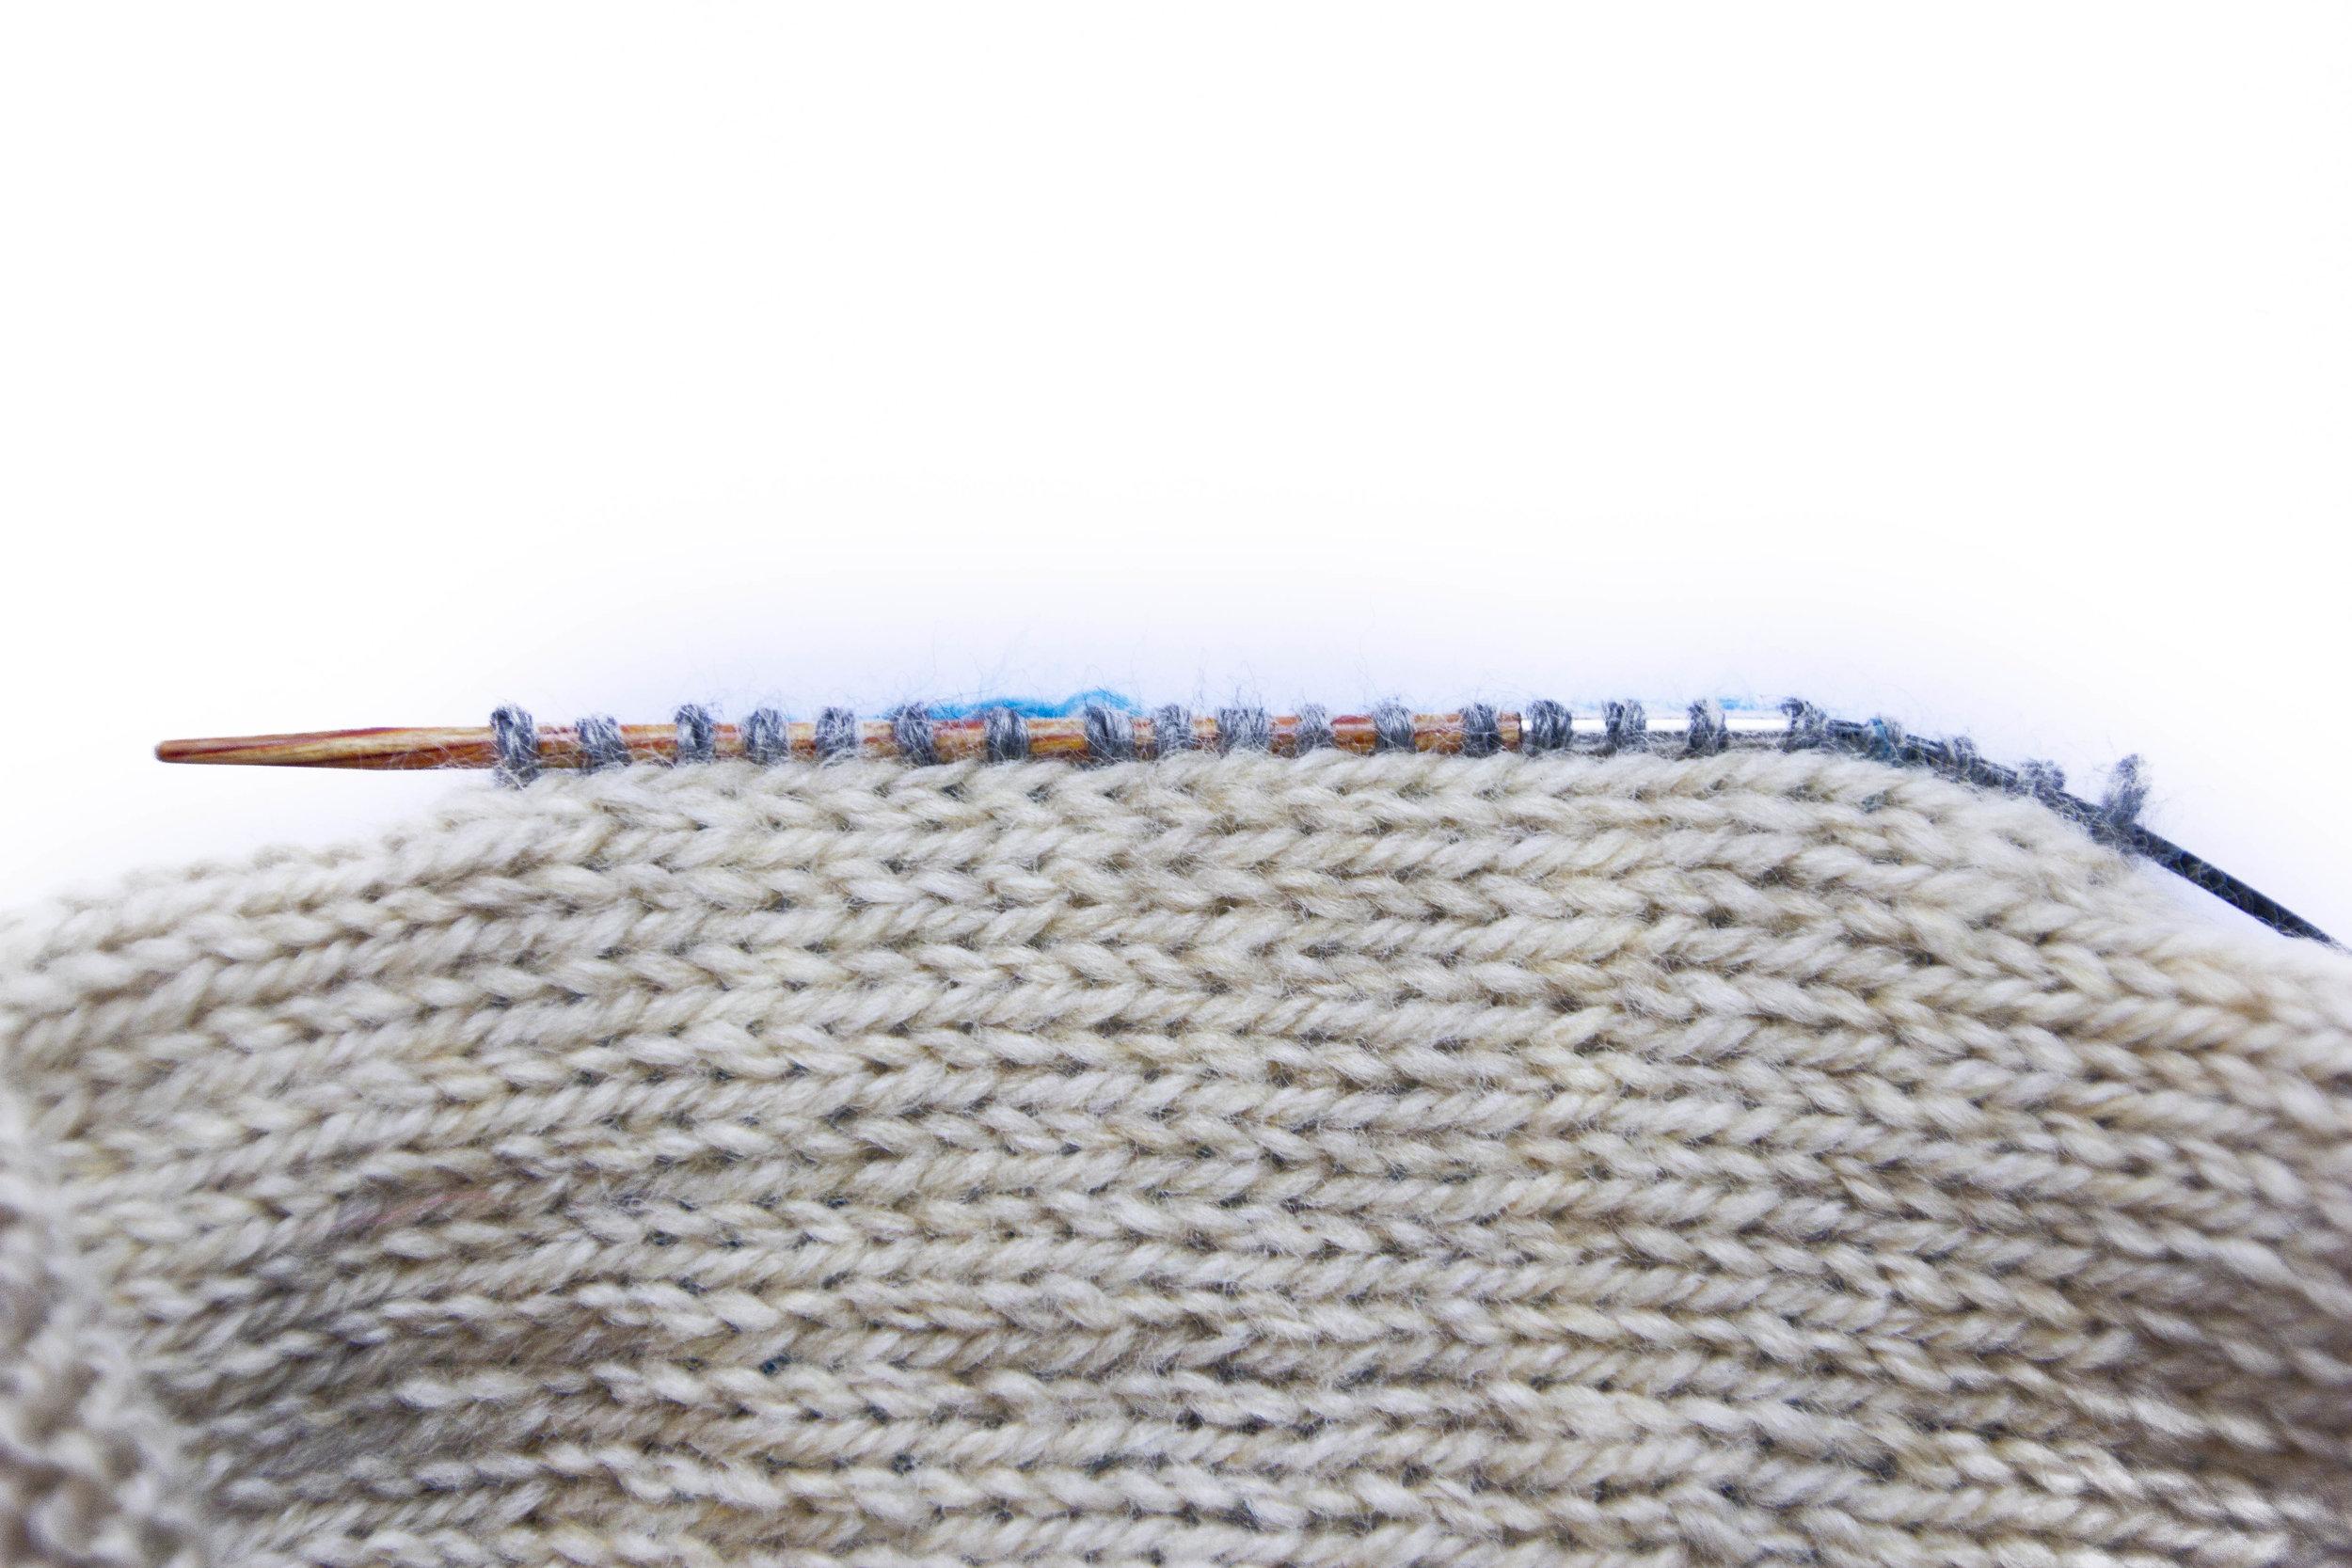 merele crochet steek 14.jpg